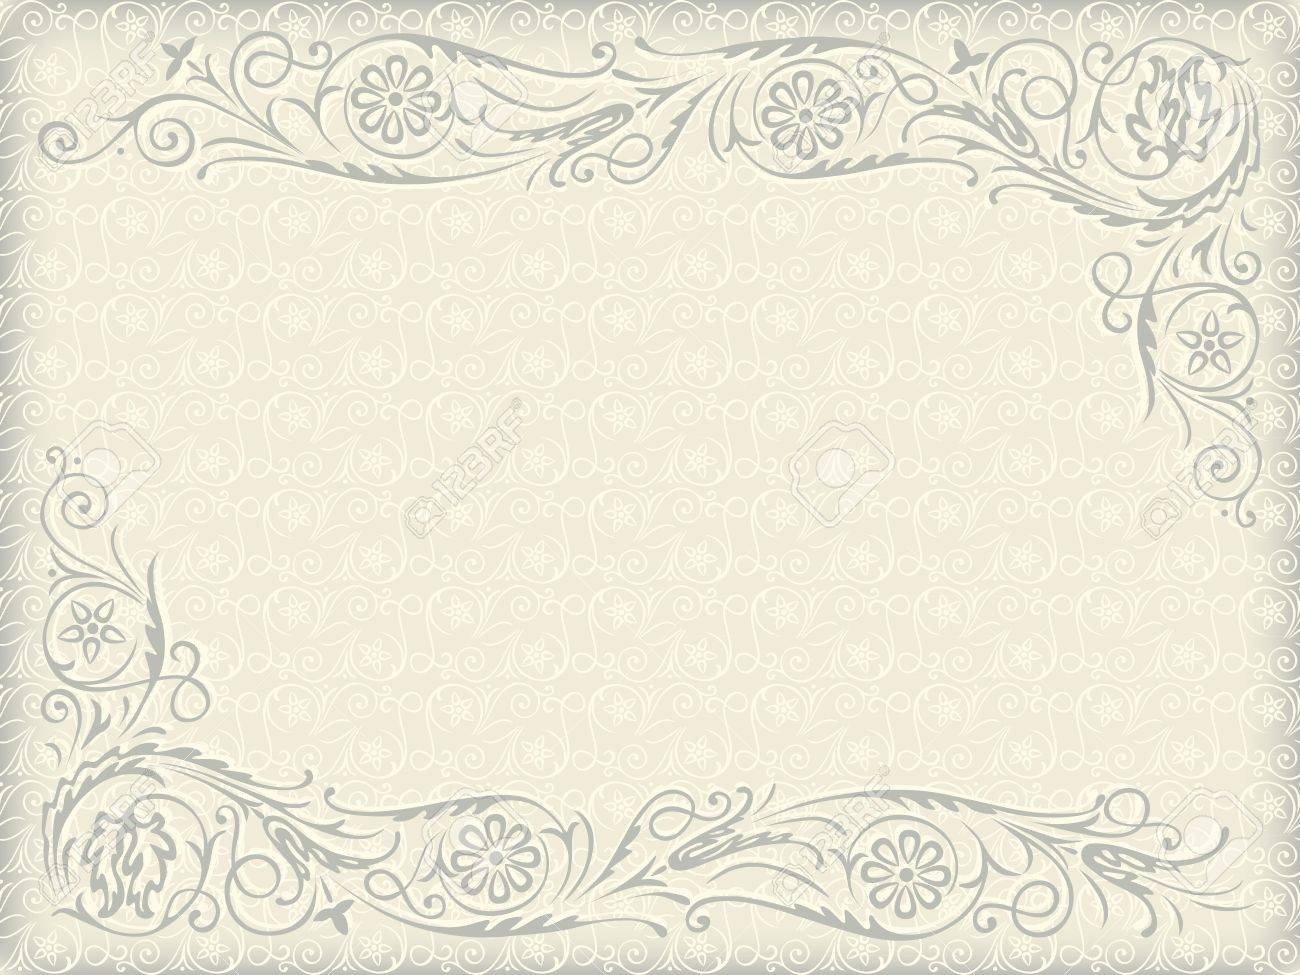 Ornamental floral wedding background frame with swirling decorative ornamental floral wedding background frame with swirling decorative elements stock vector 15646178 junglespirit Choice Image